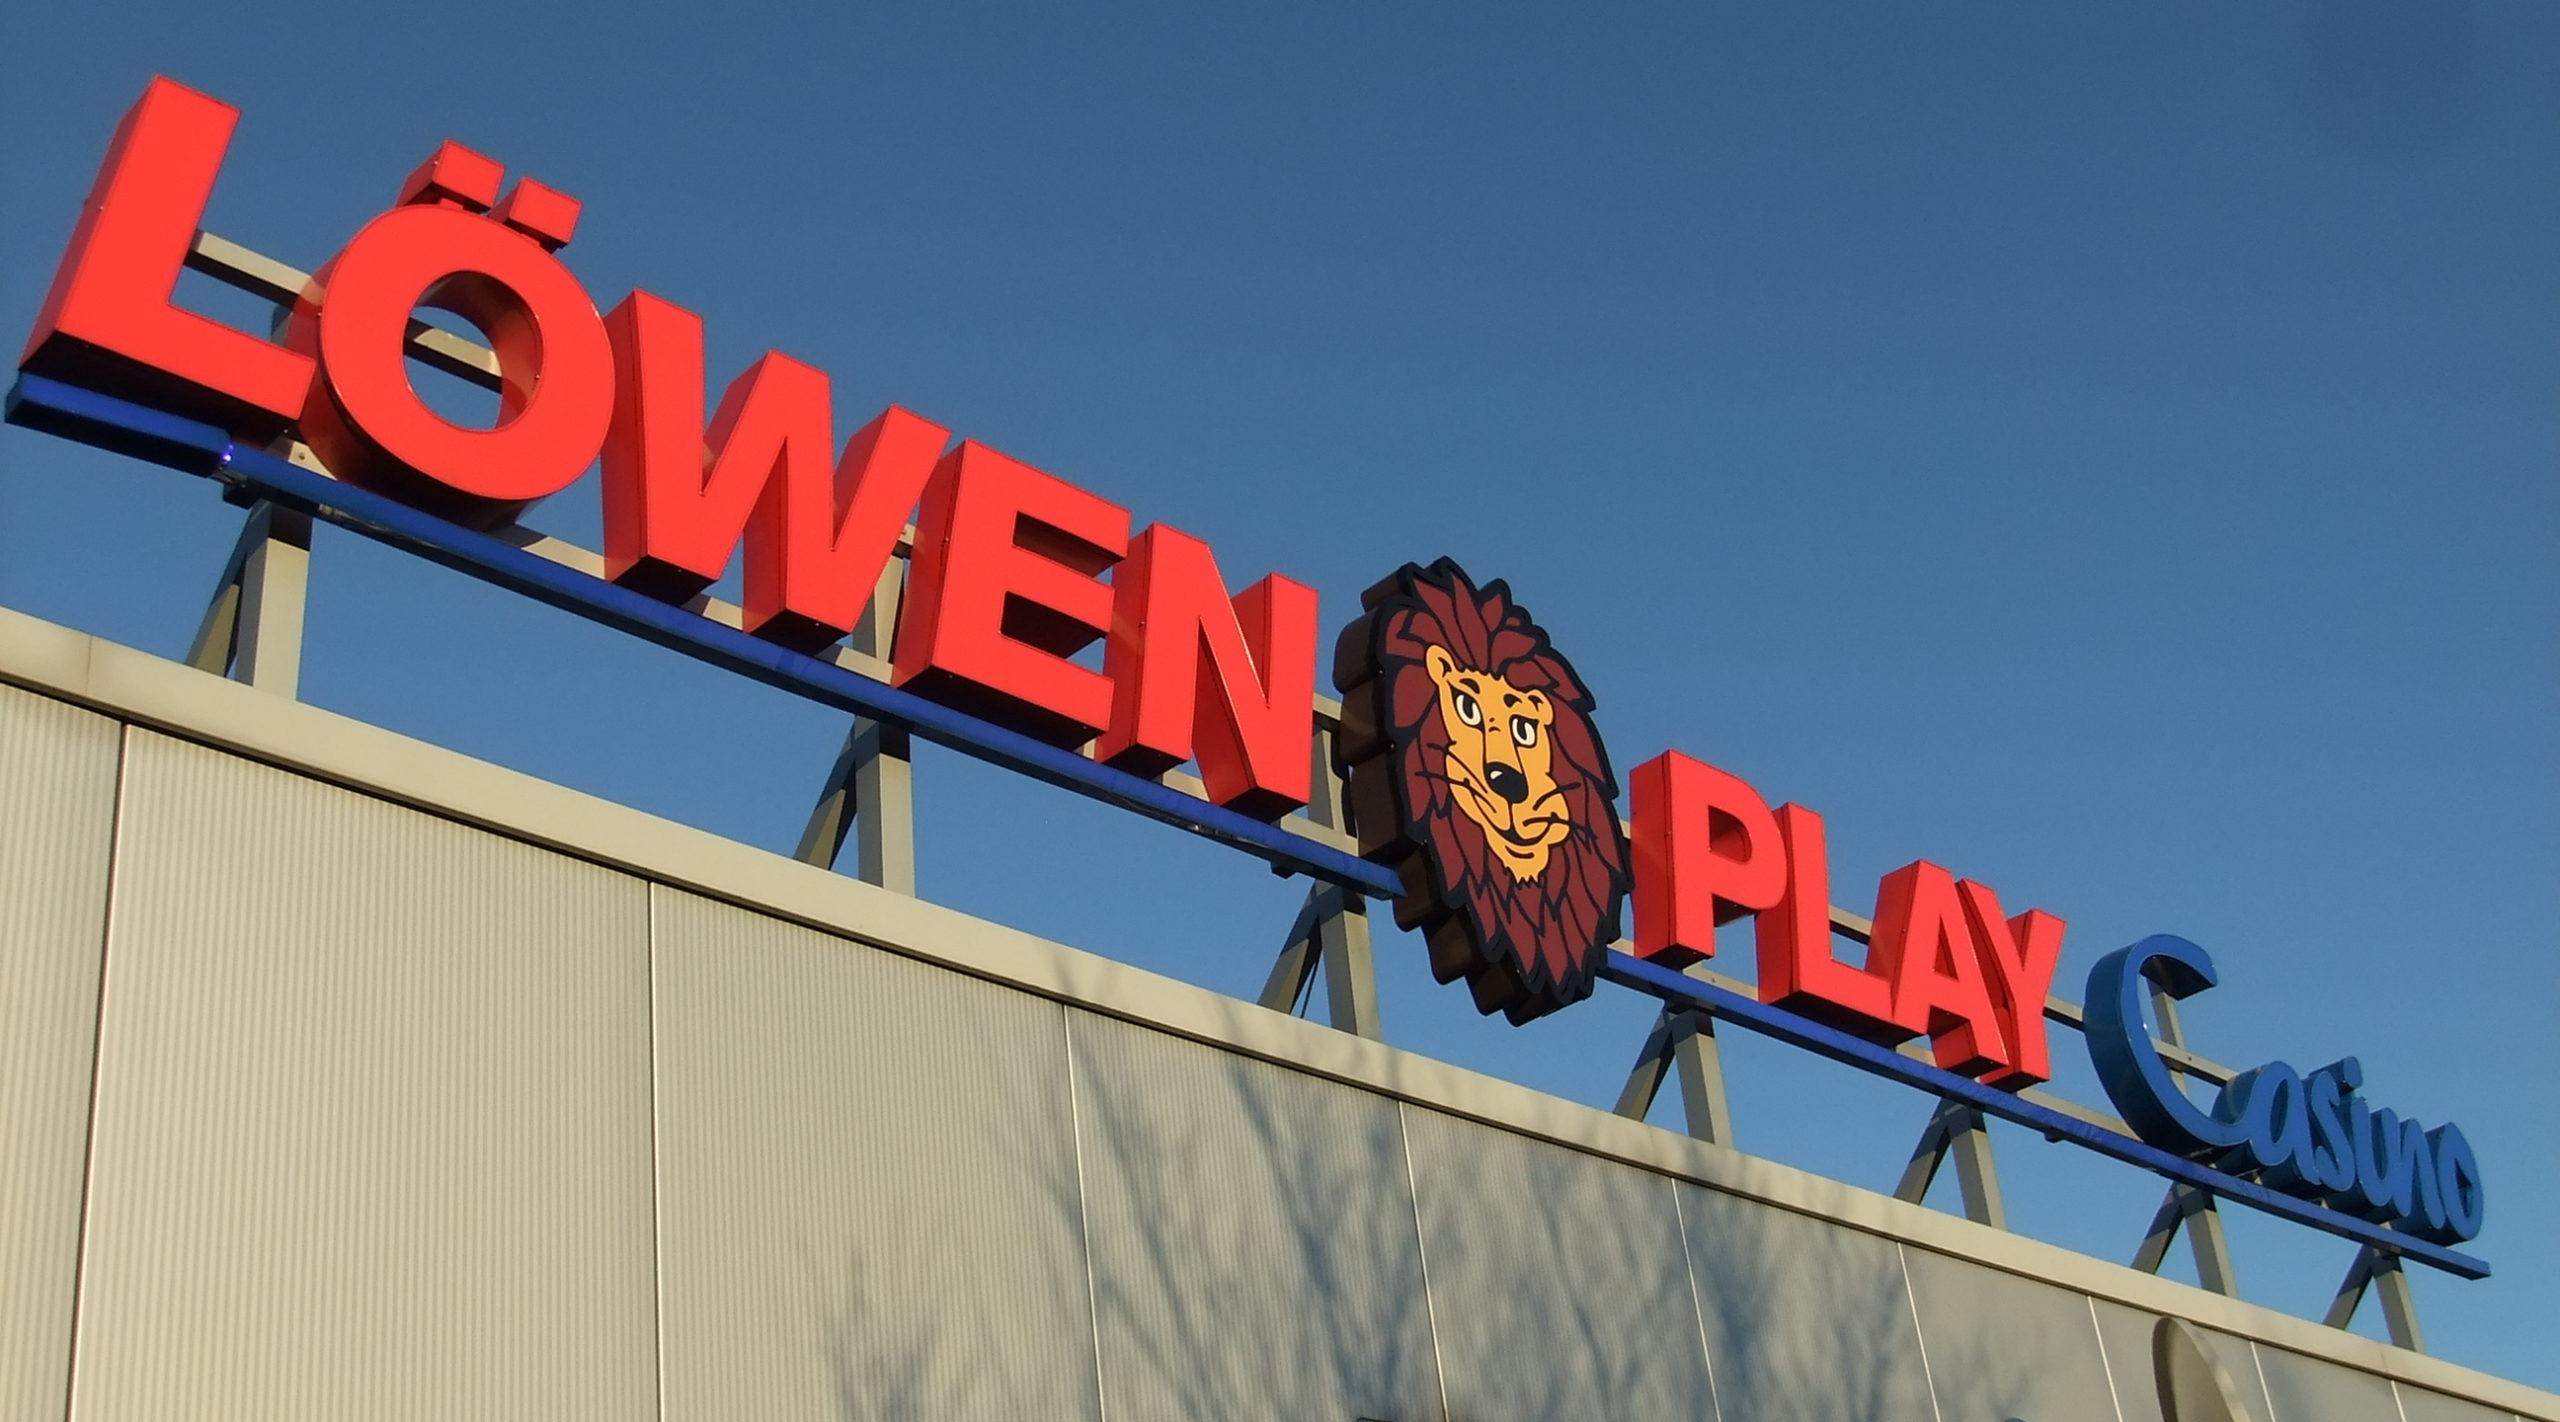 Löwenplay Casino